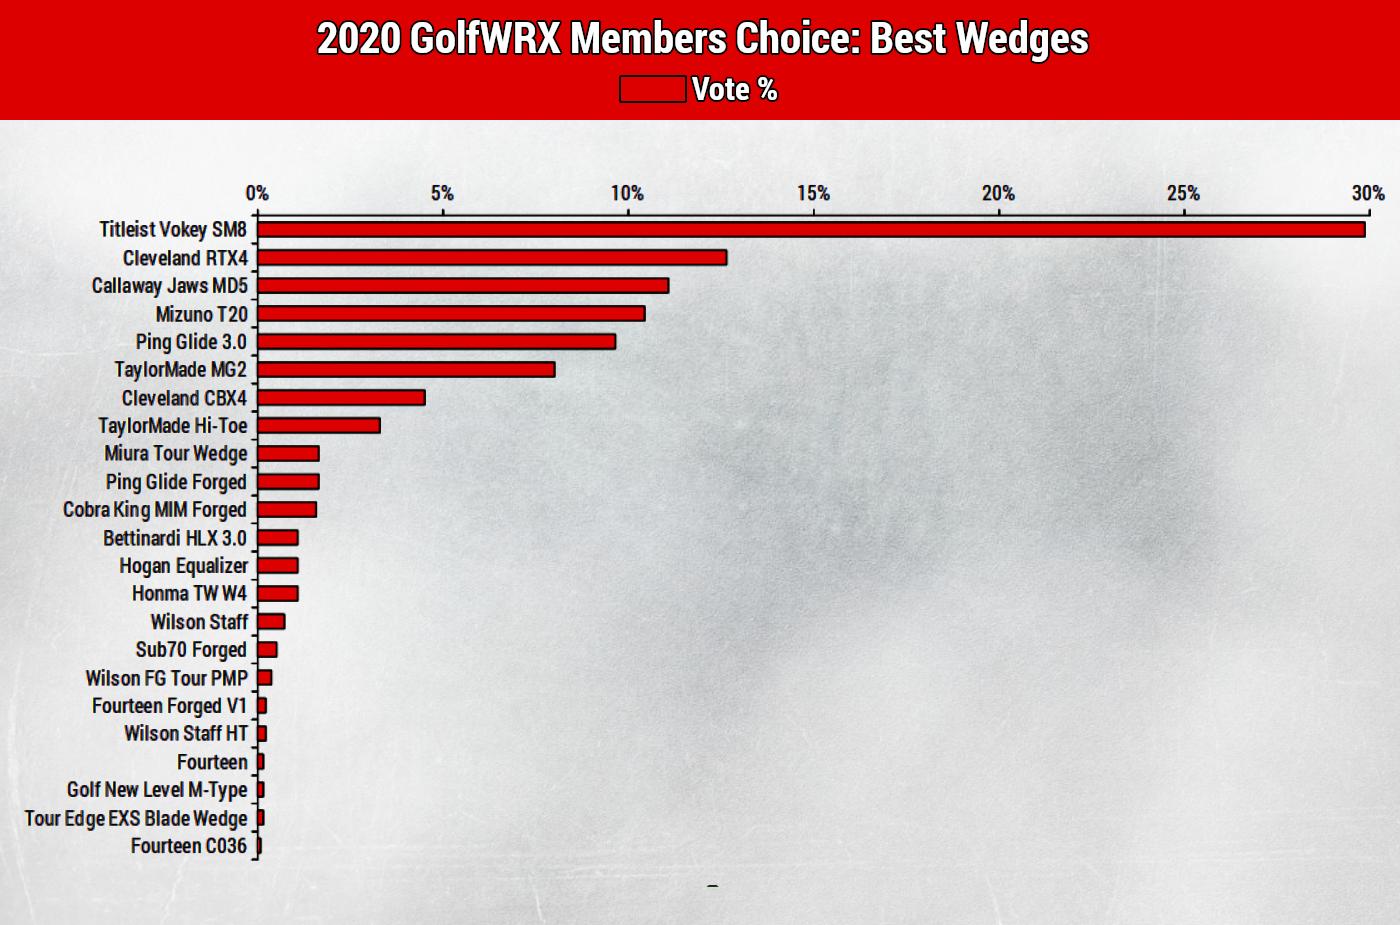 best-wedges-of-2020-golfwrx-